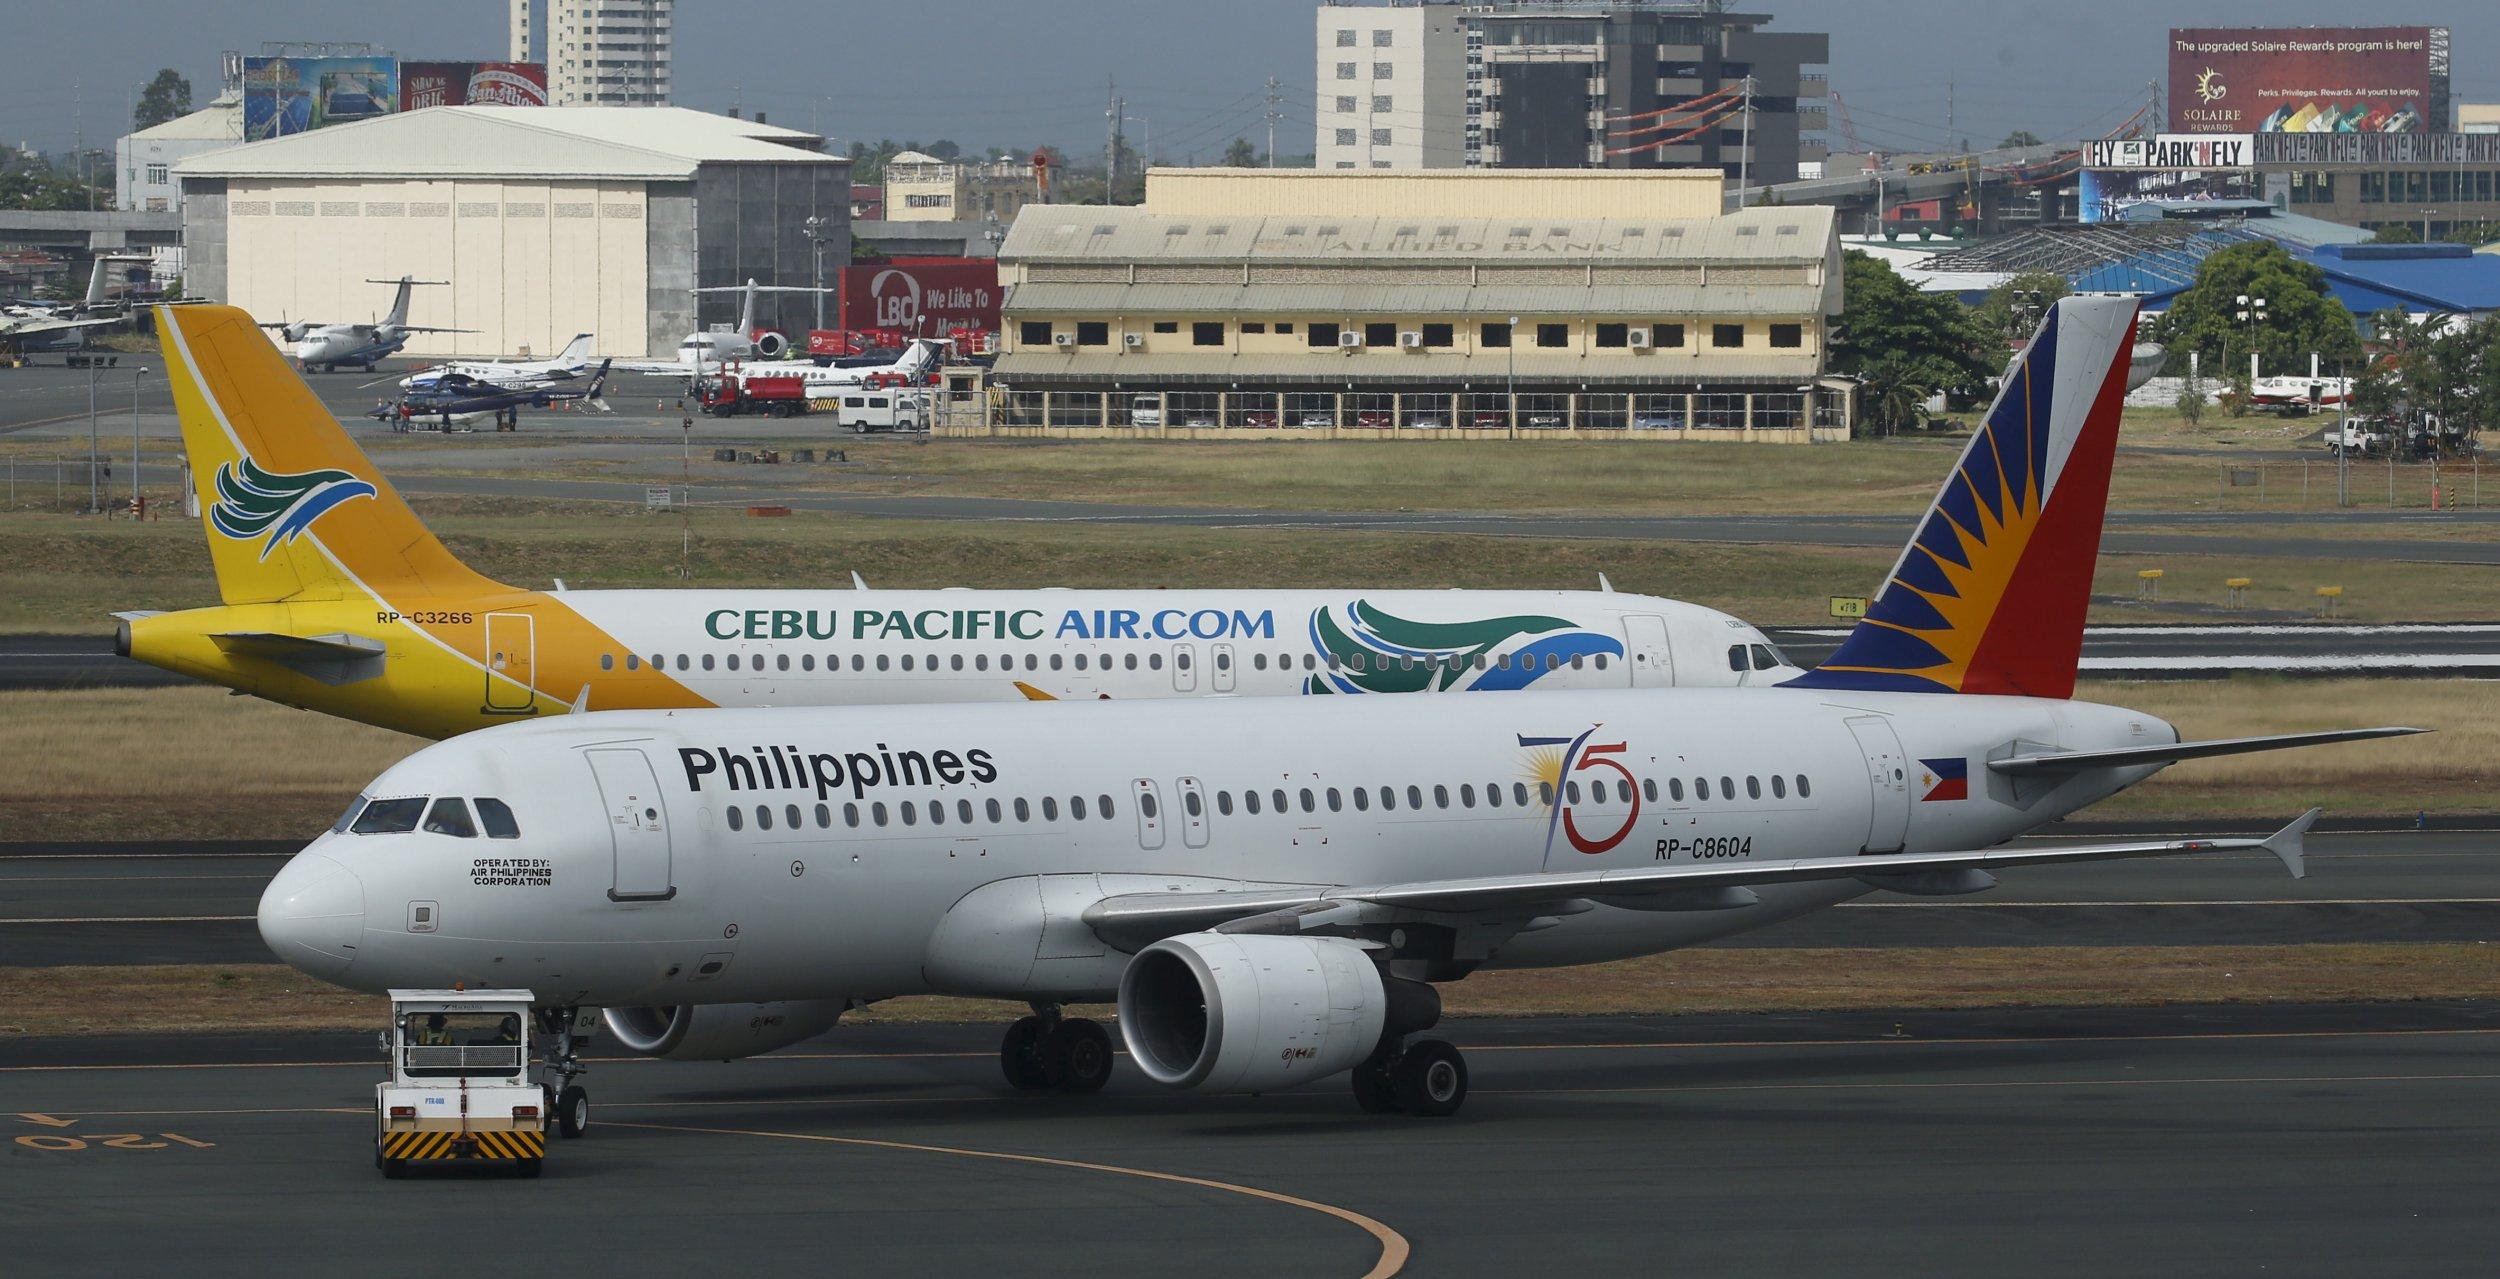 Cebu Pacific jet